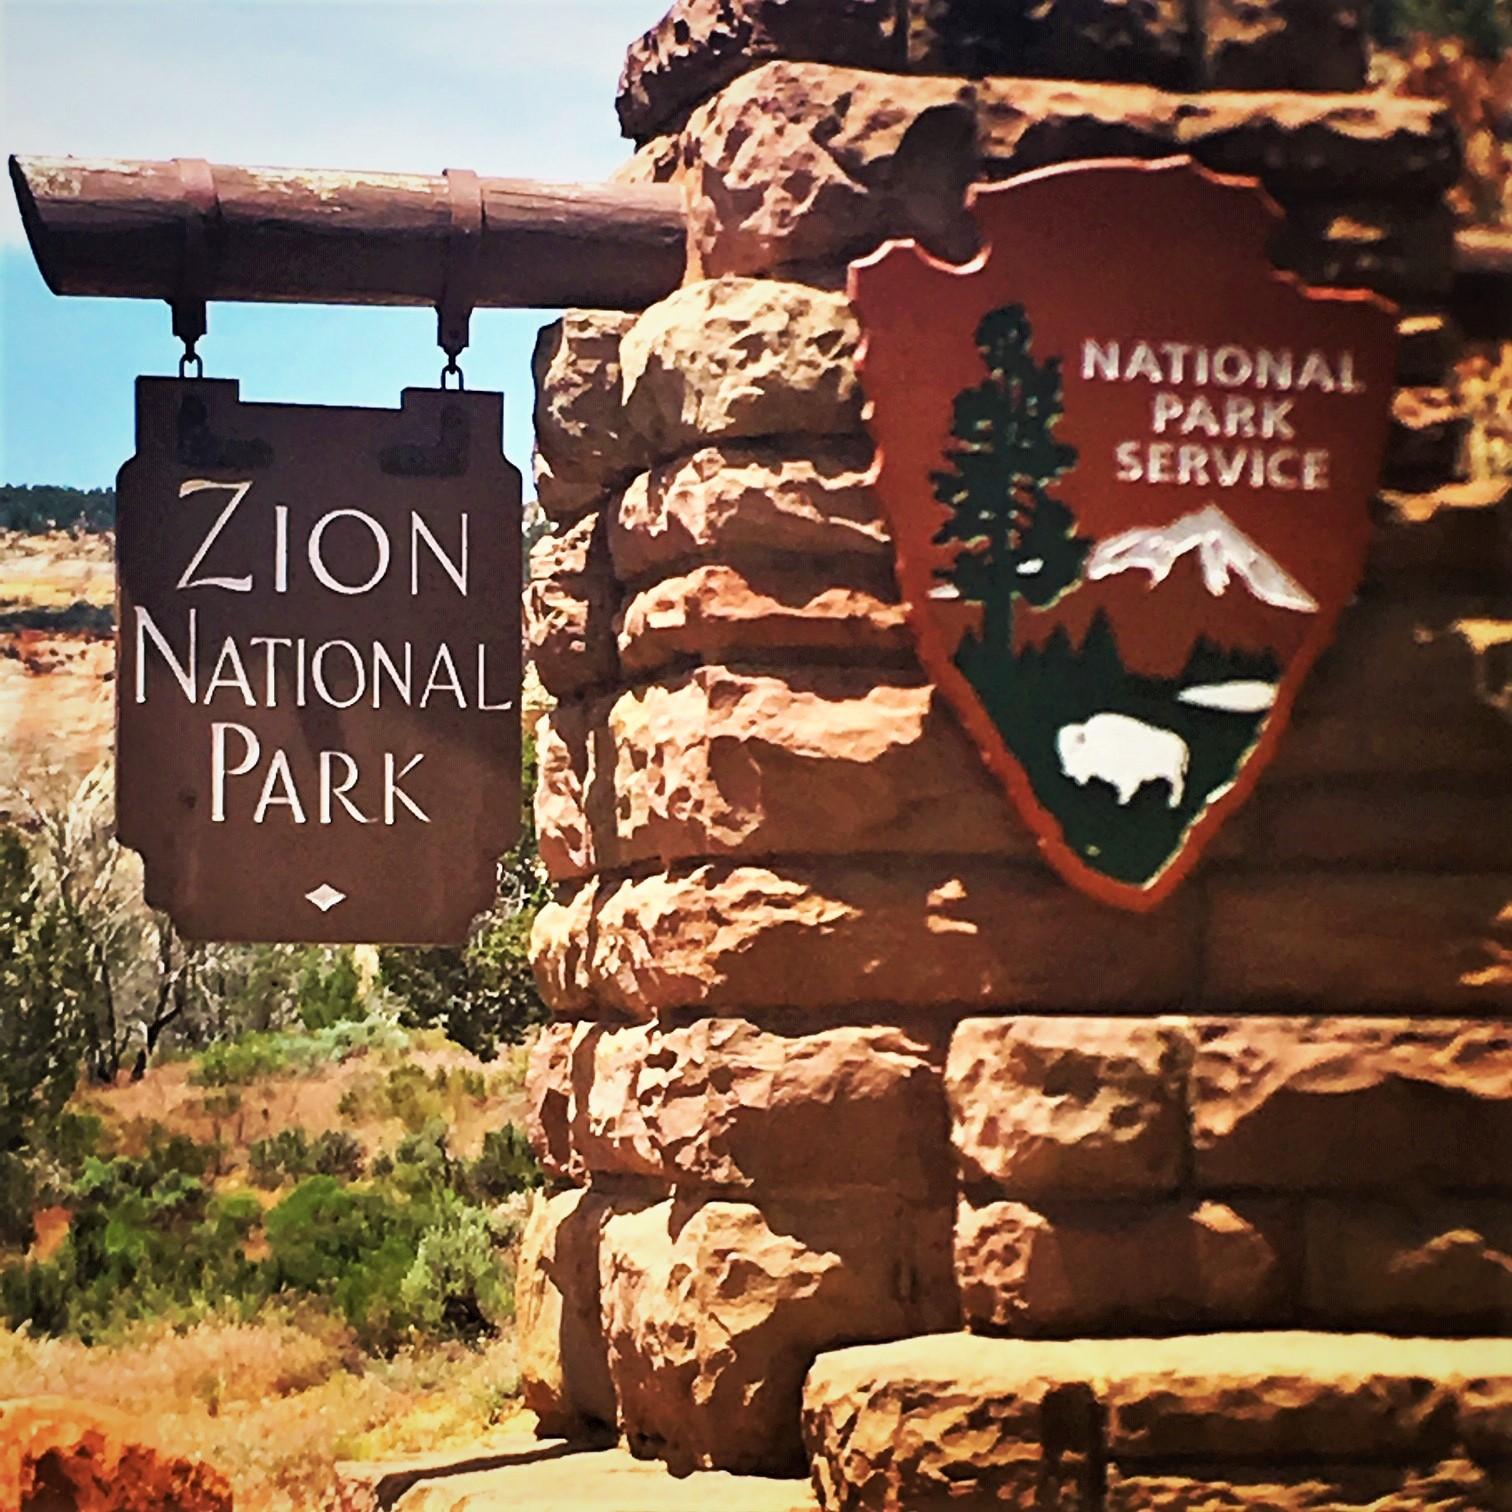 Zion National Park - Utah's Best Vacation Rentals   Photo by: Tiffany Triem